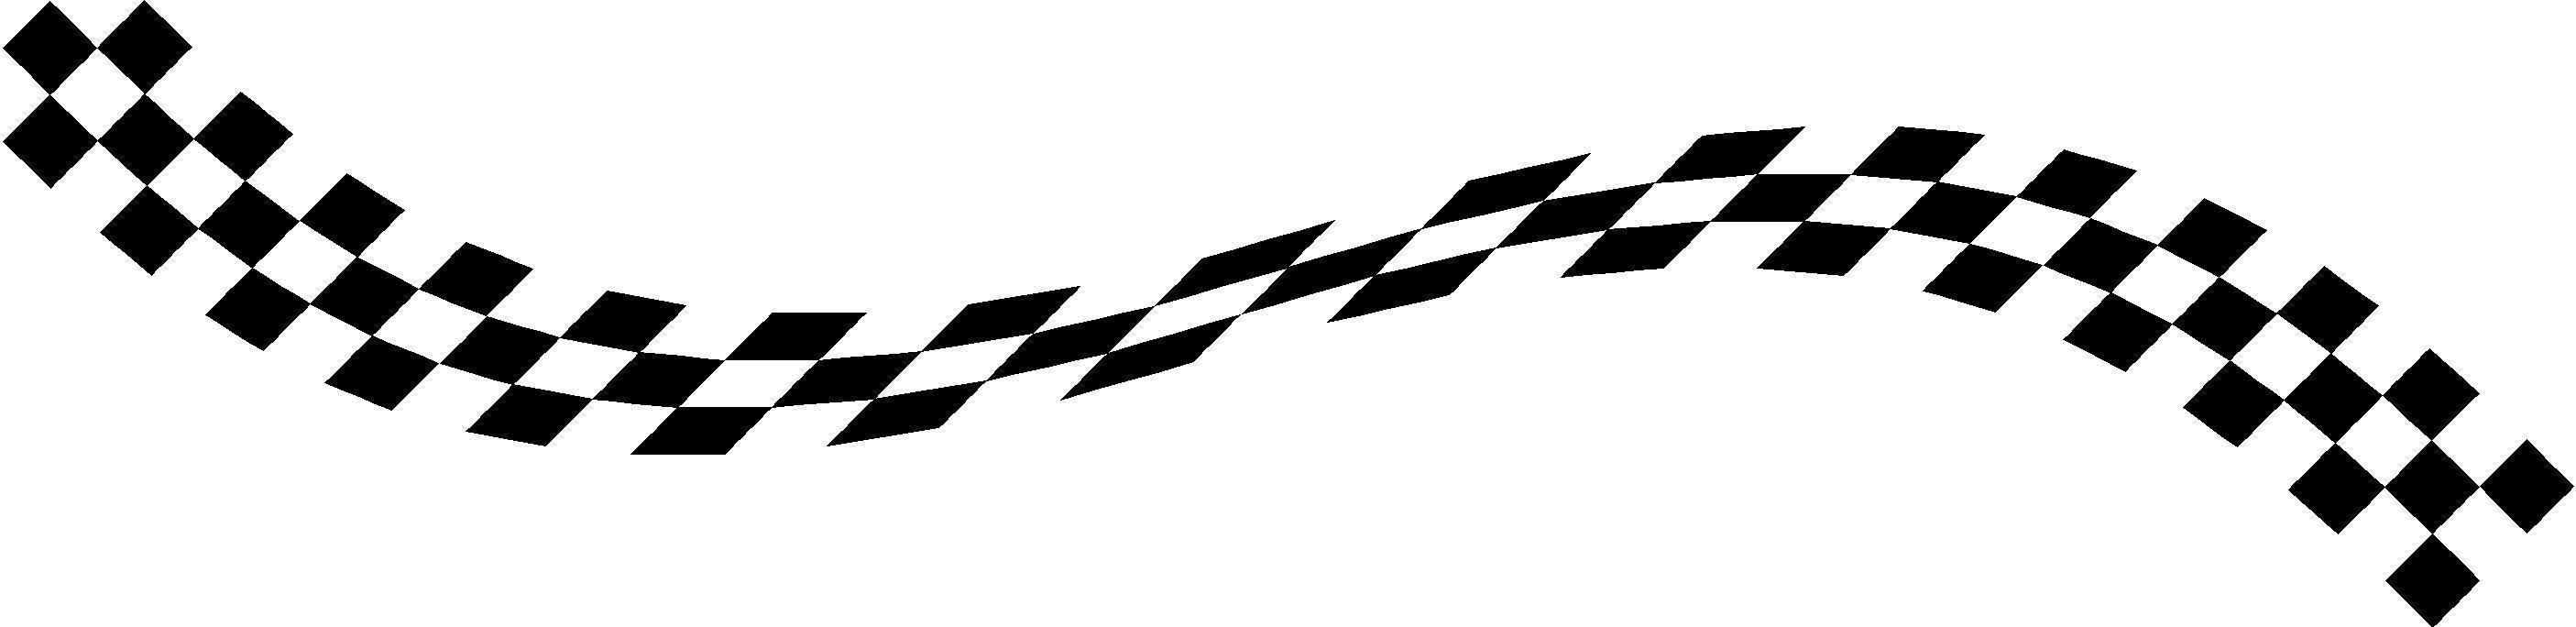 Checkered Flag Decal / Sticker 32